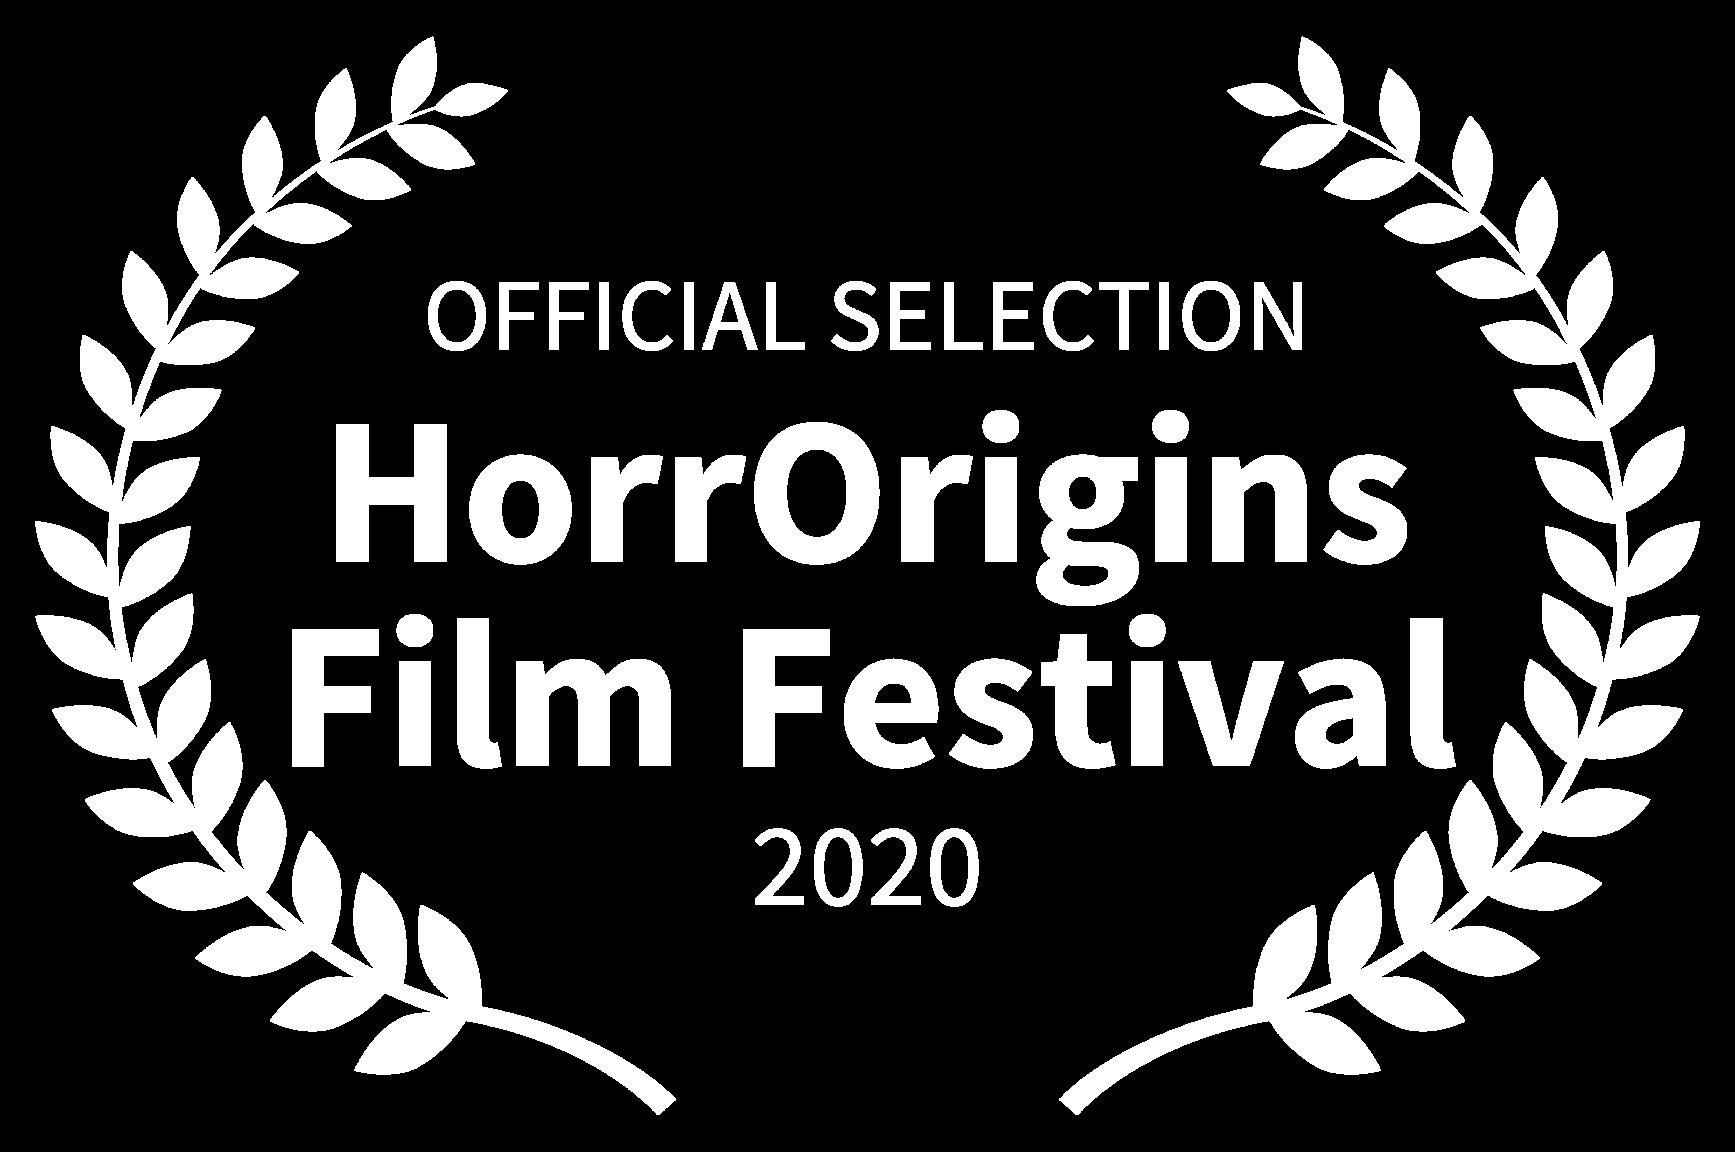 OFFICIAL SELECTION - HorrOrigins Film Festival - 2020